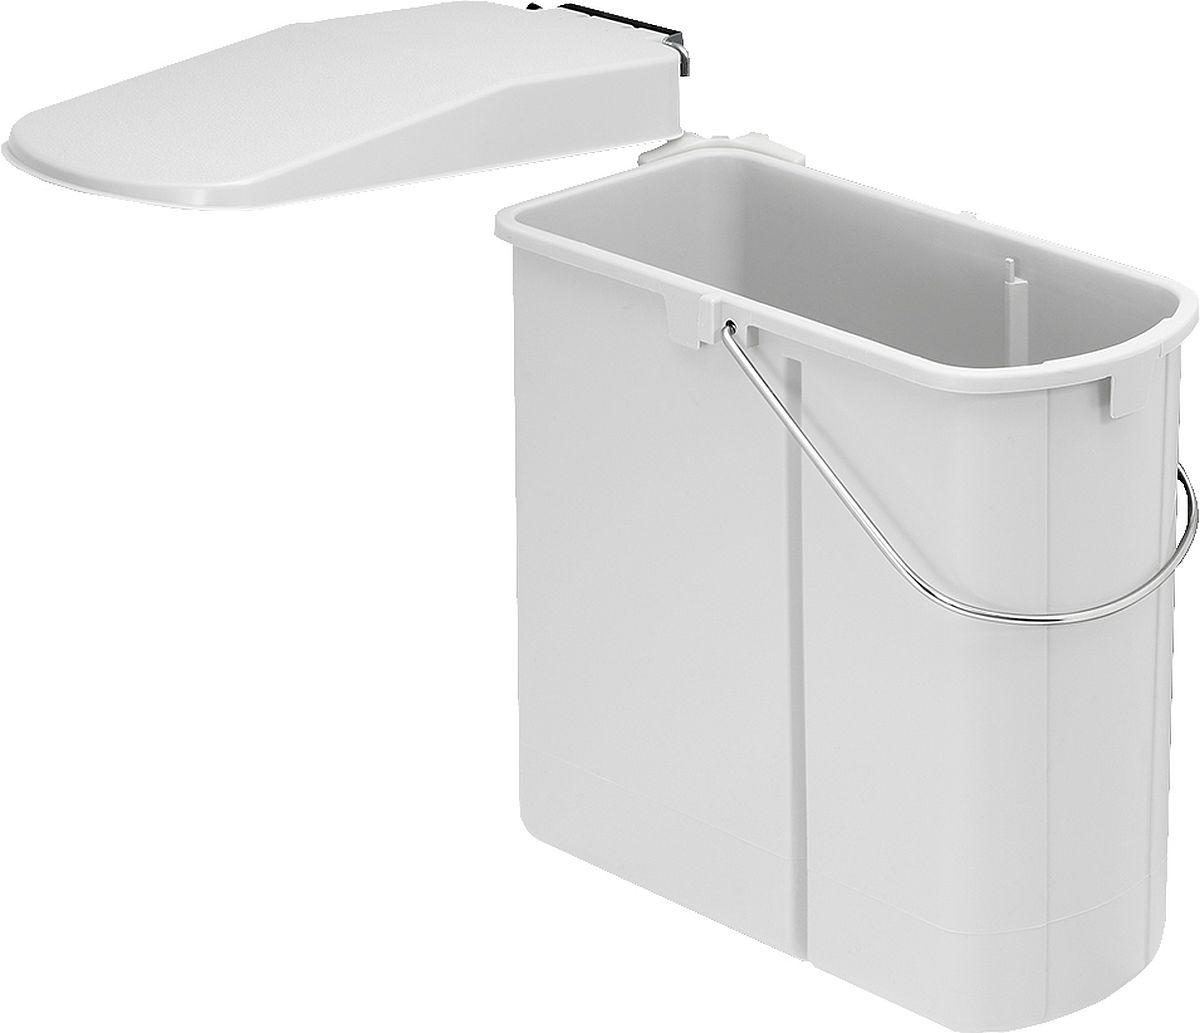 Full Size of Abfalleimer Küche Plastik Abfalleimer Küche Einbau Hailo Abfalleimer Küche Sensor Abfalleimer Küche Freistehend Küche Abfalleimer Küche